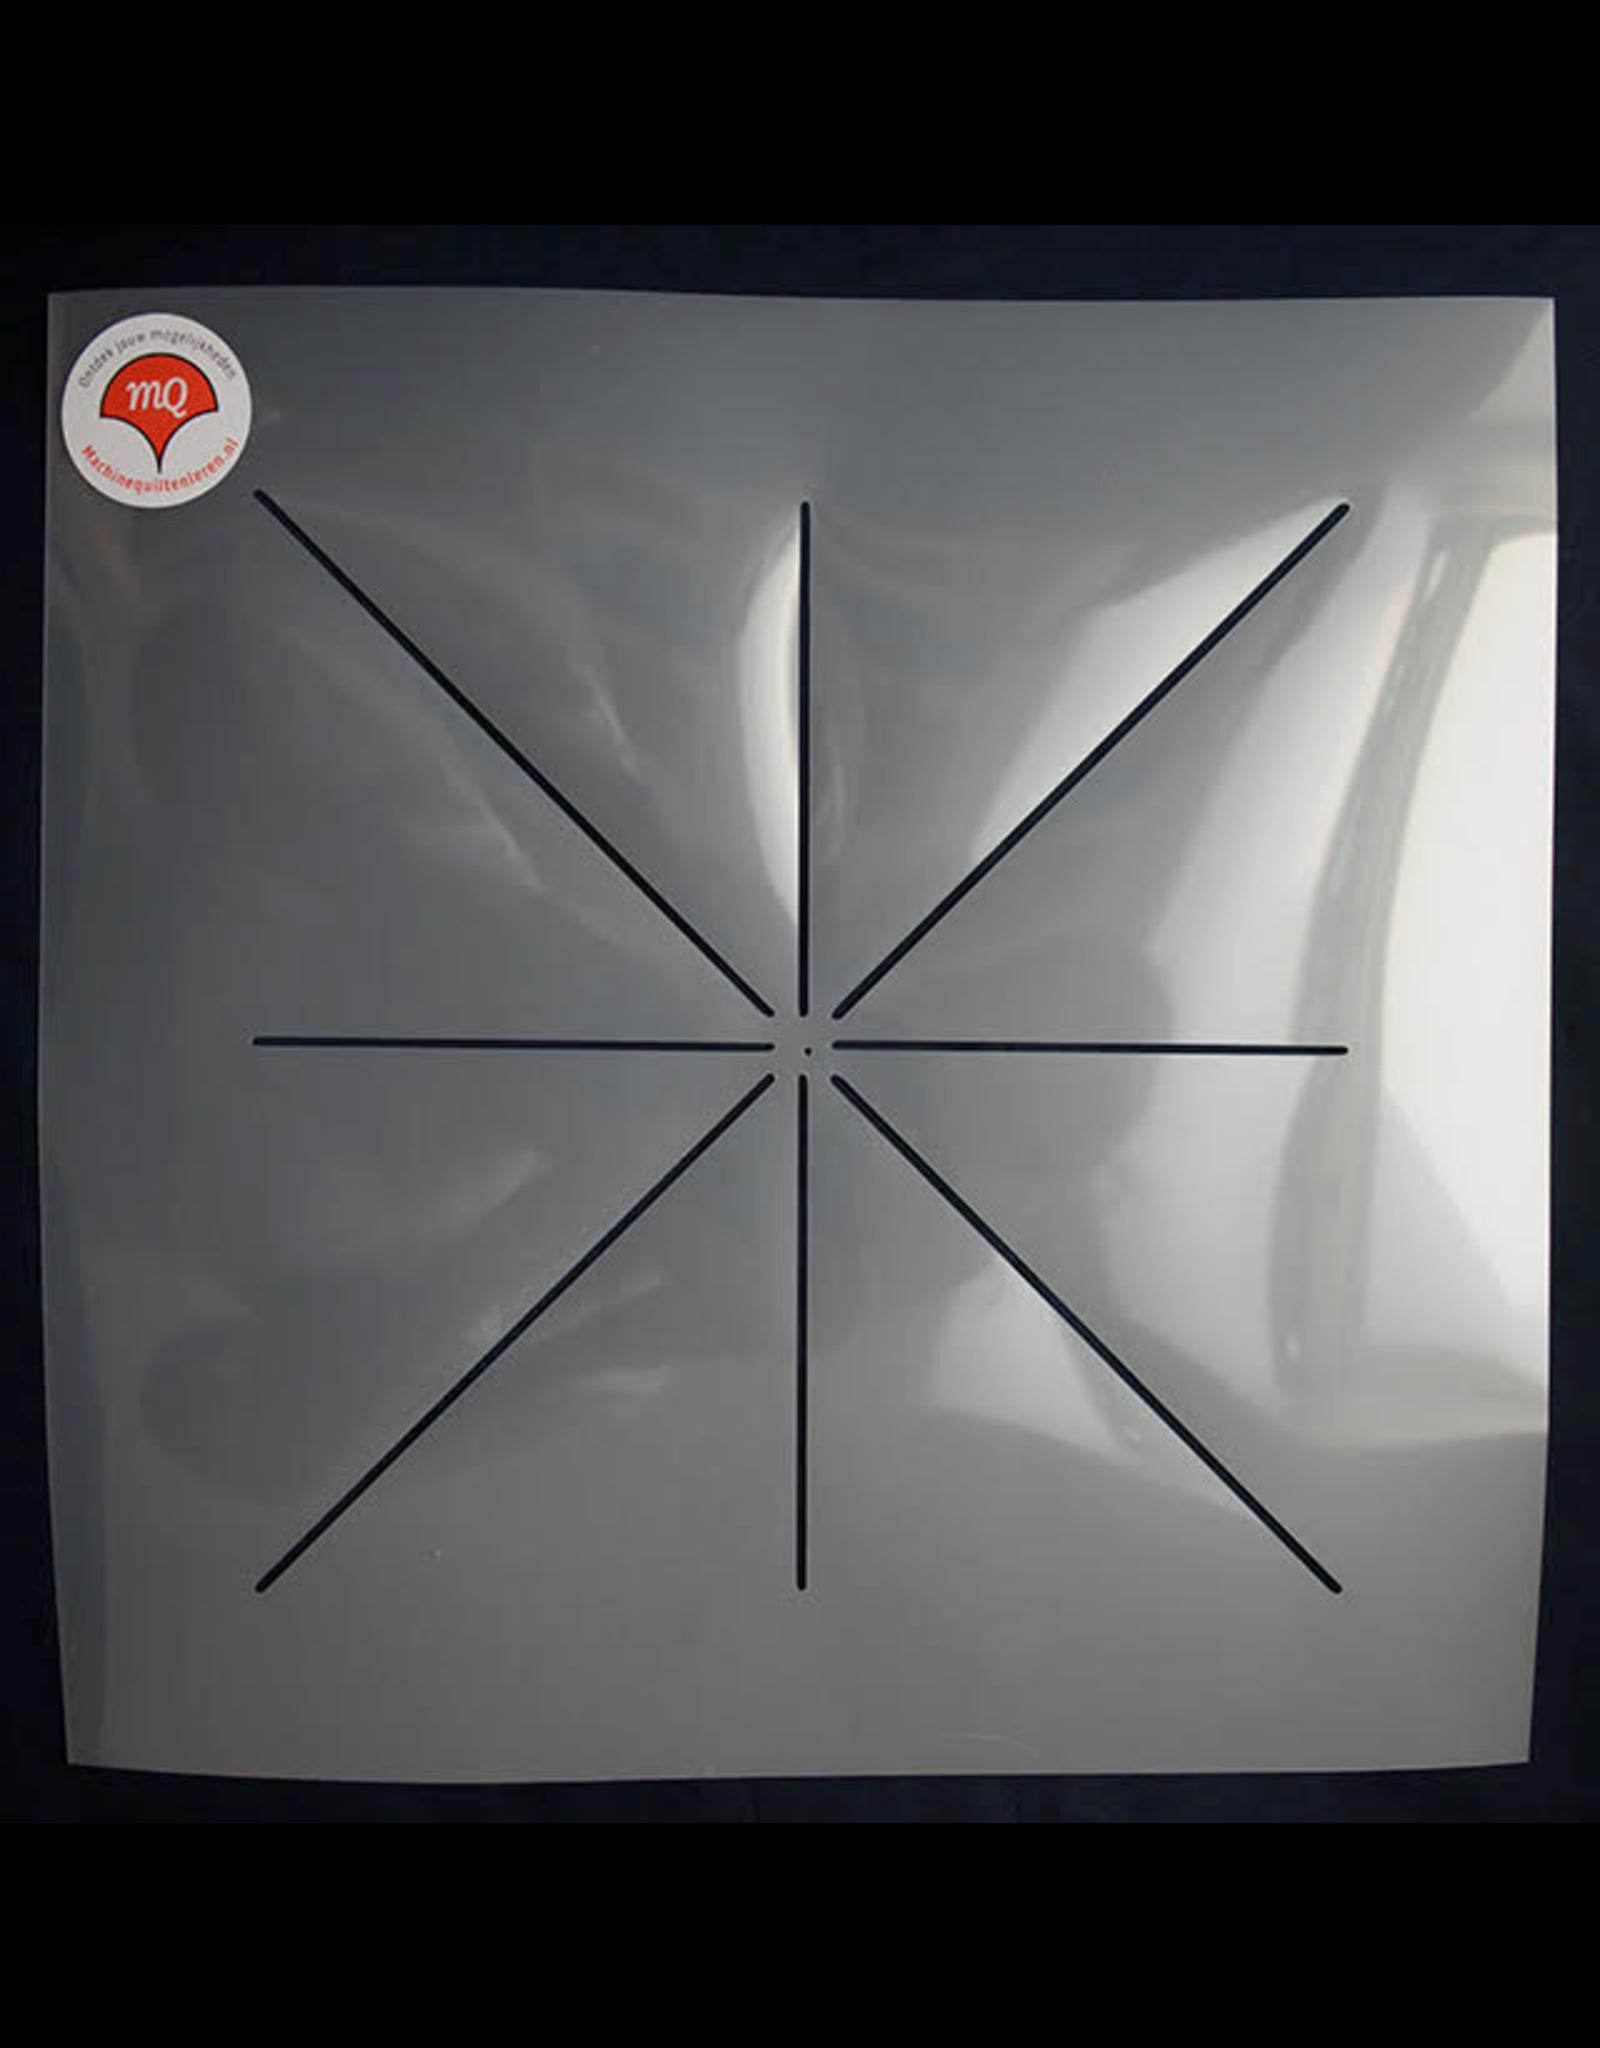 MQ MQ Grid - Crosshair 8